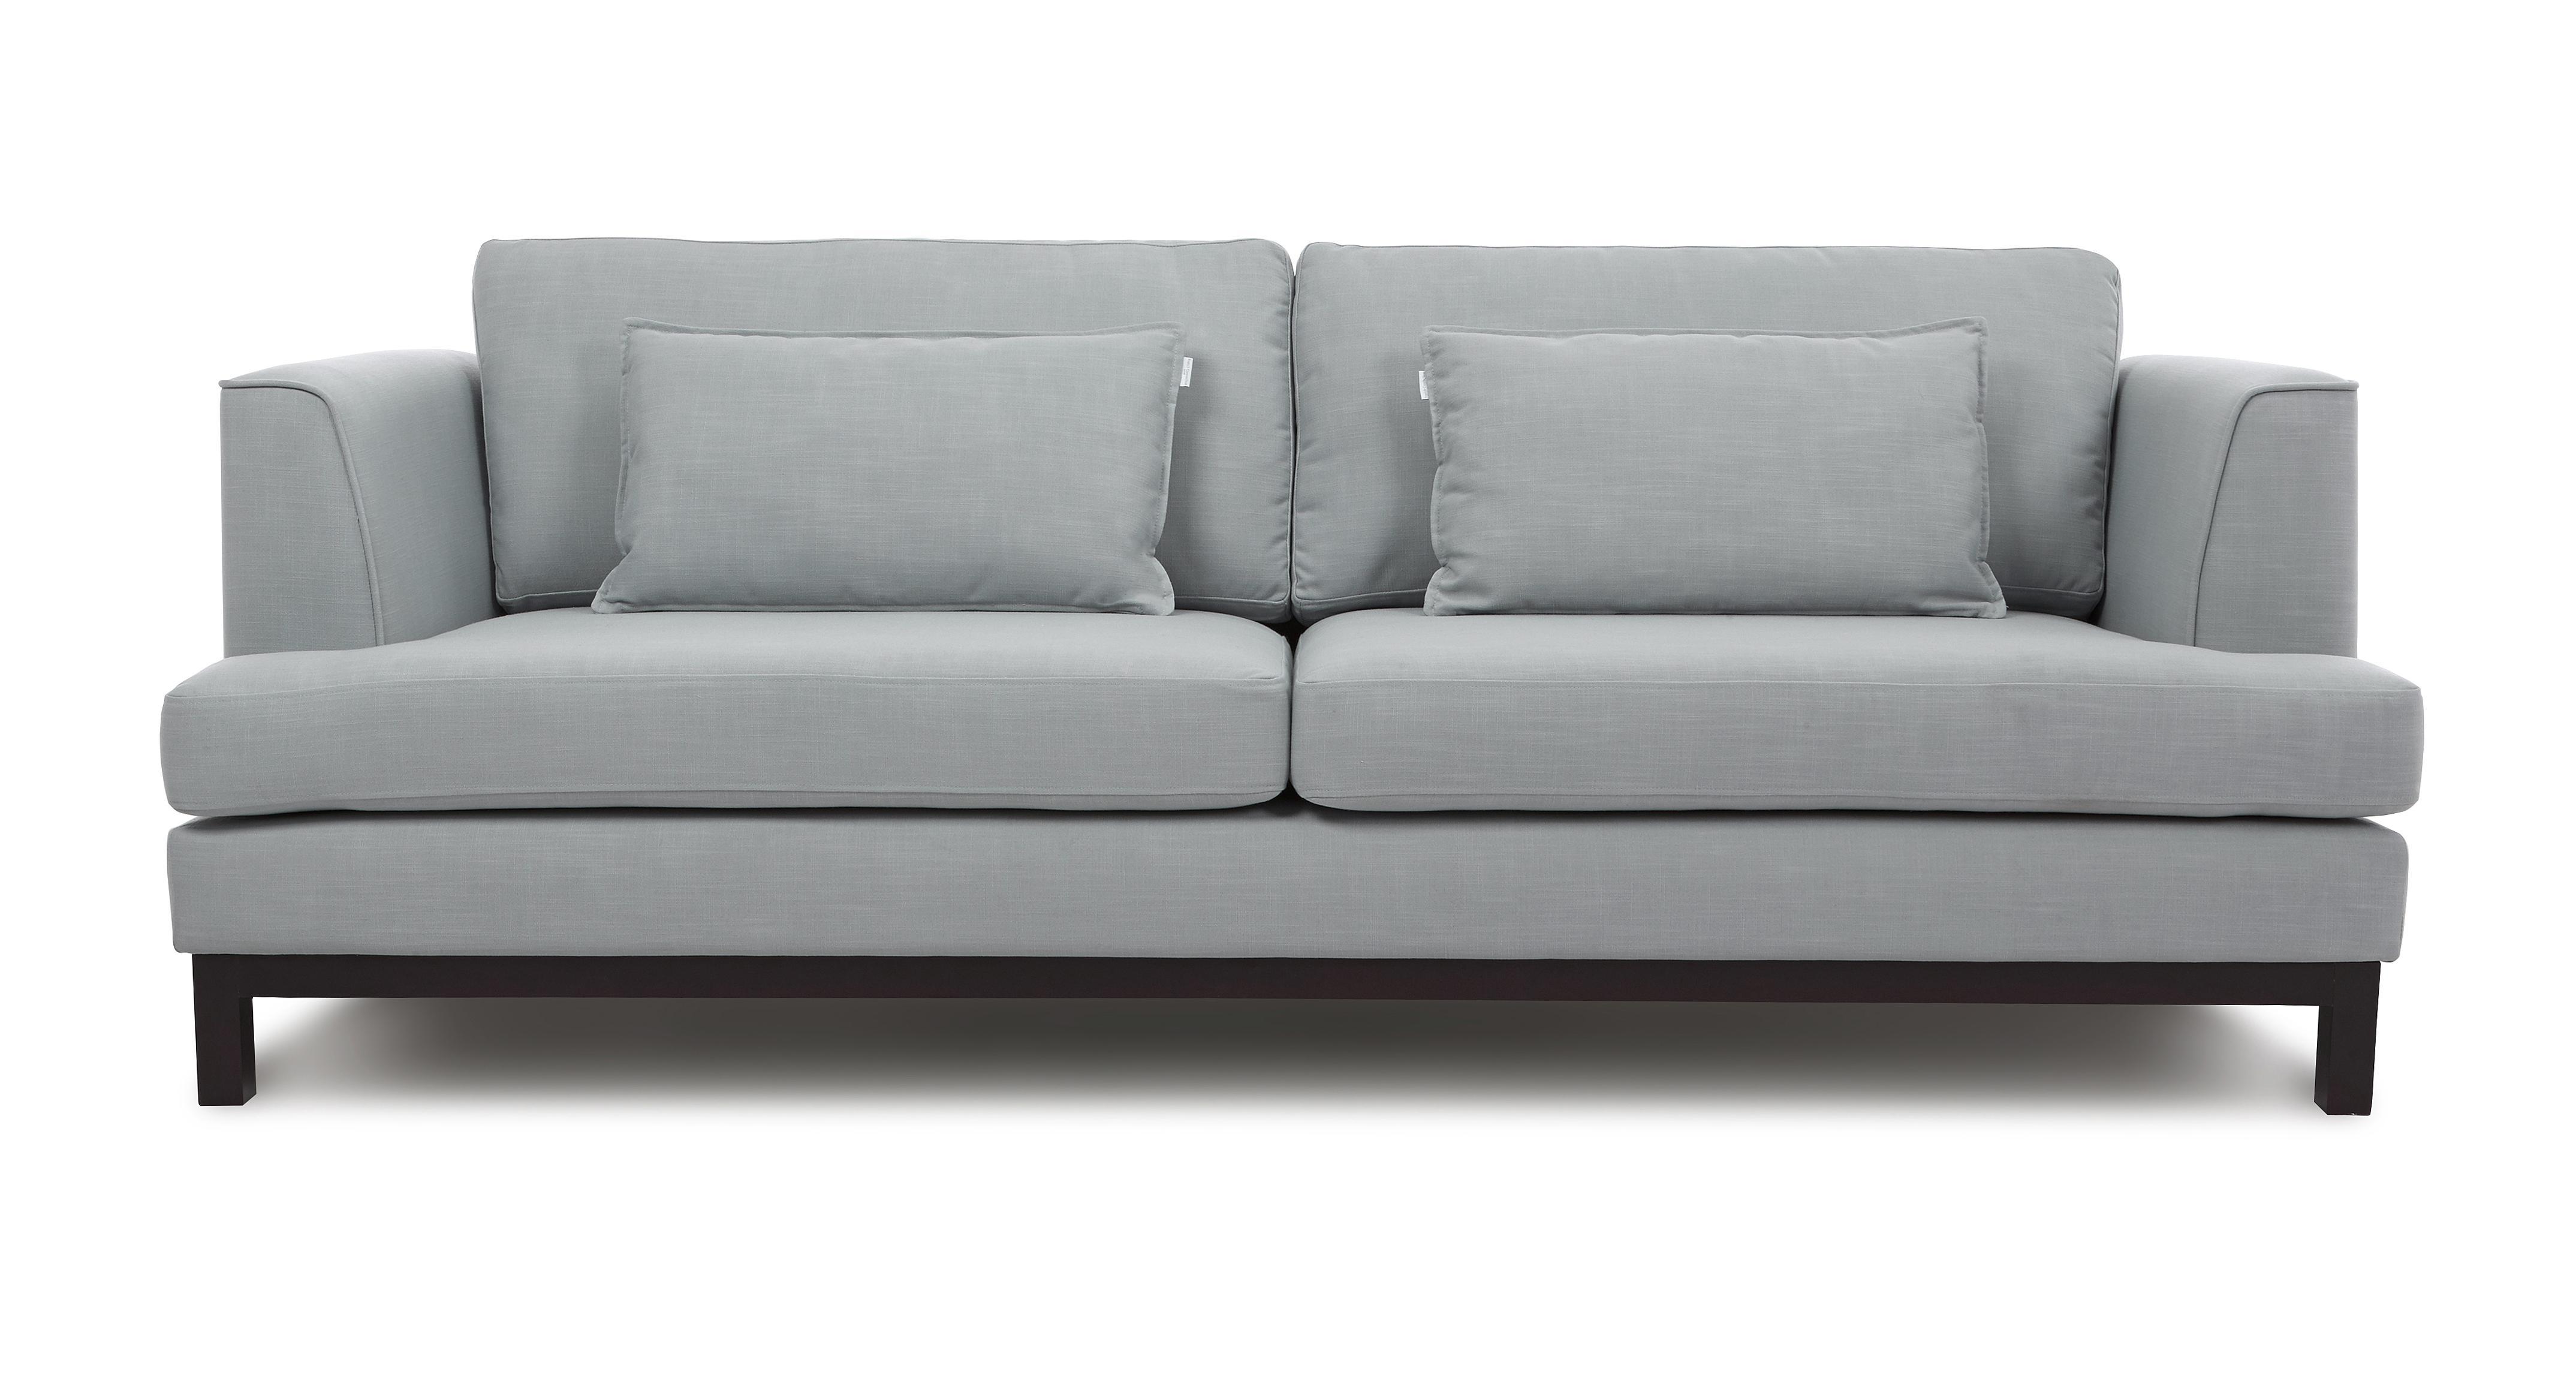 Flint 4 Seater Sofa